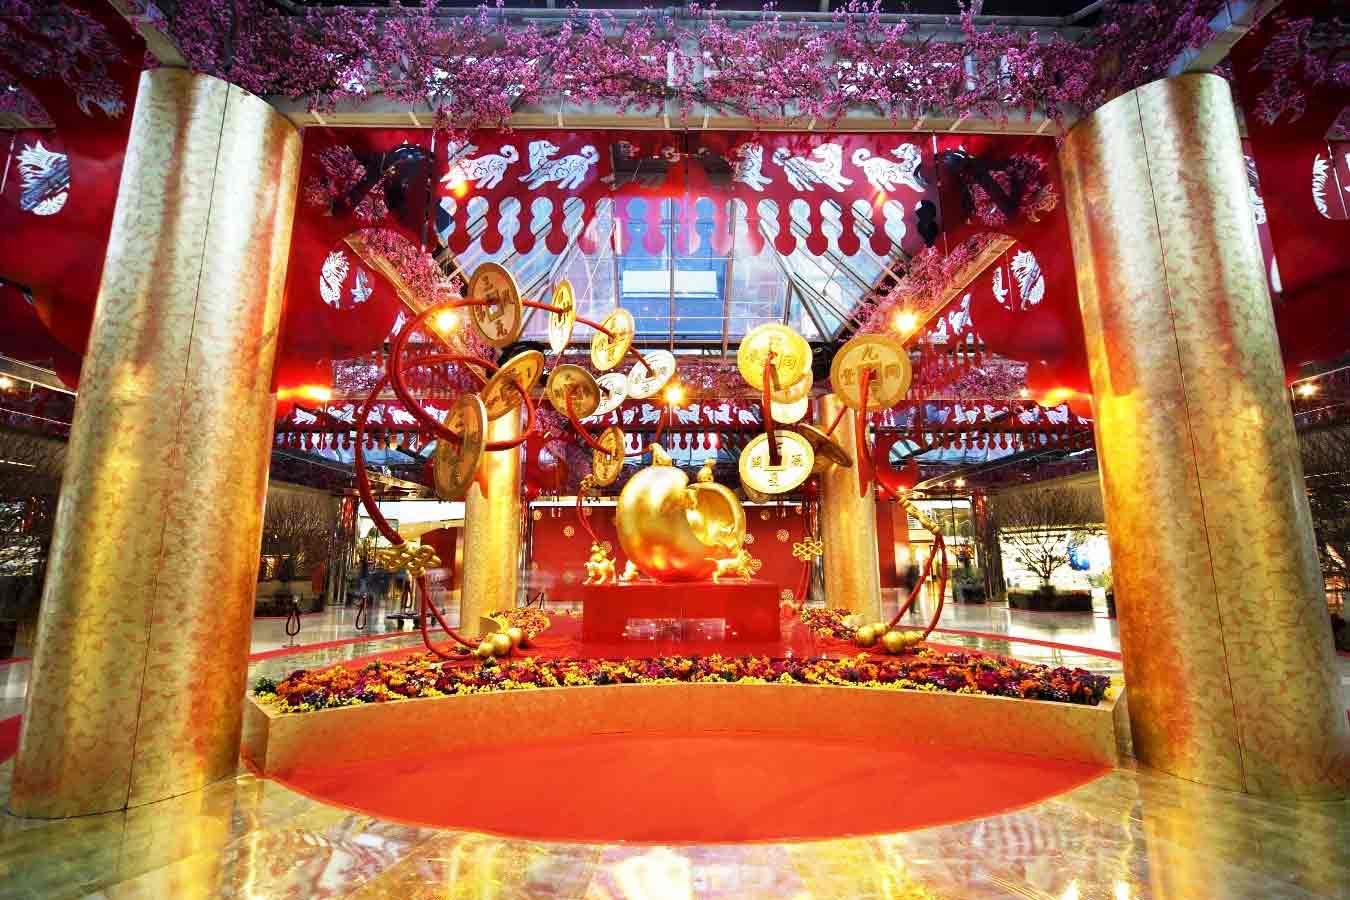 dekorasi imlek gapura emas dan merah styrofoam